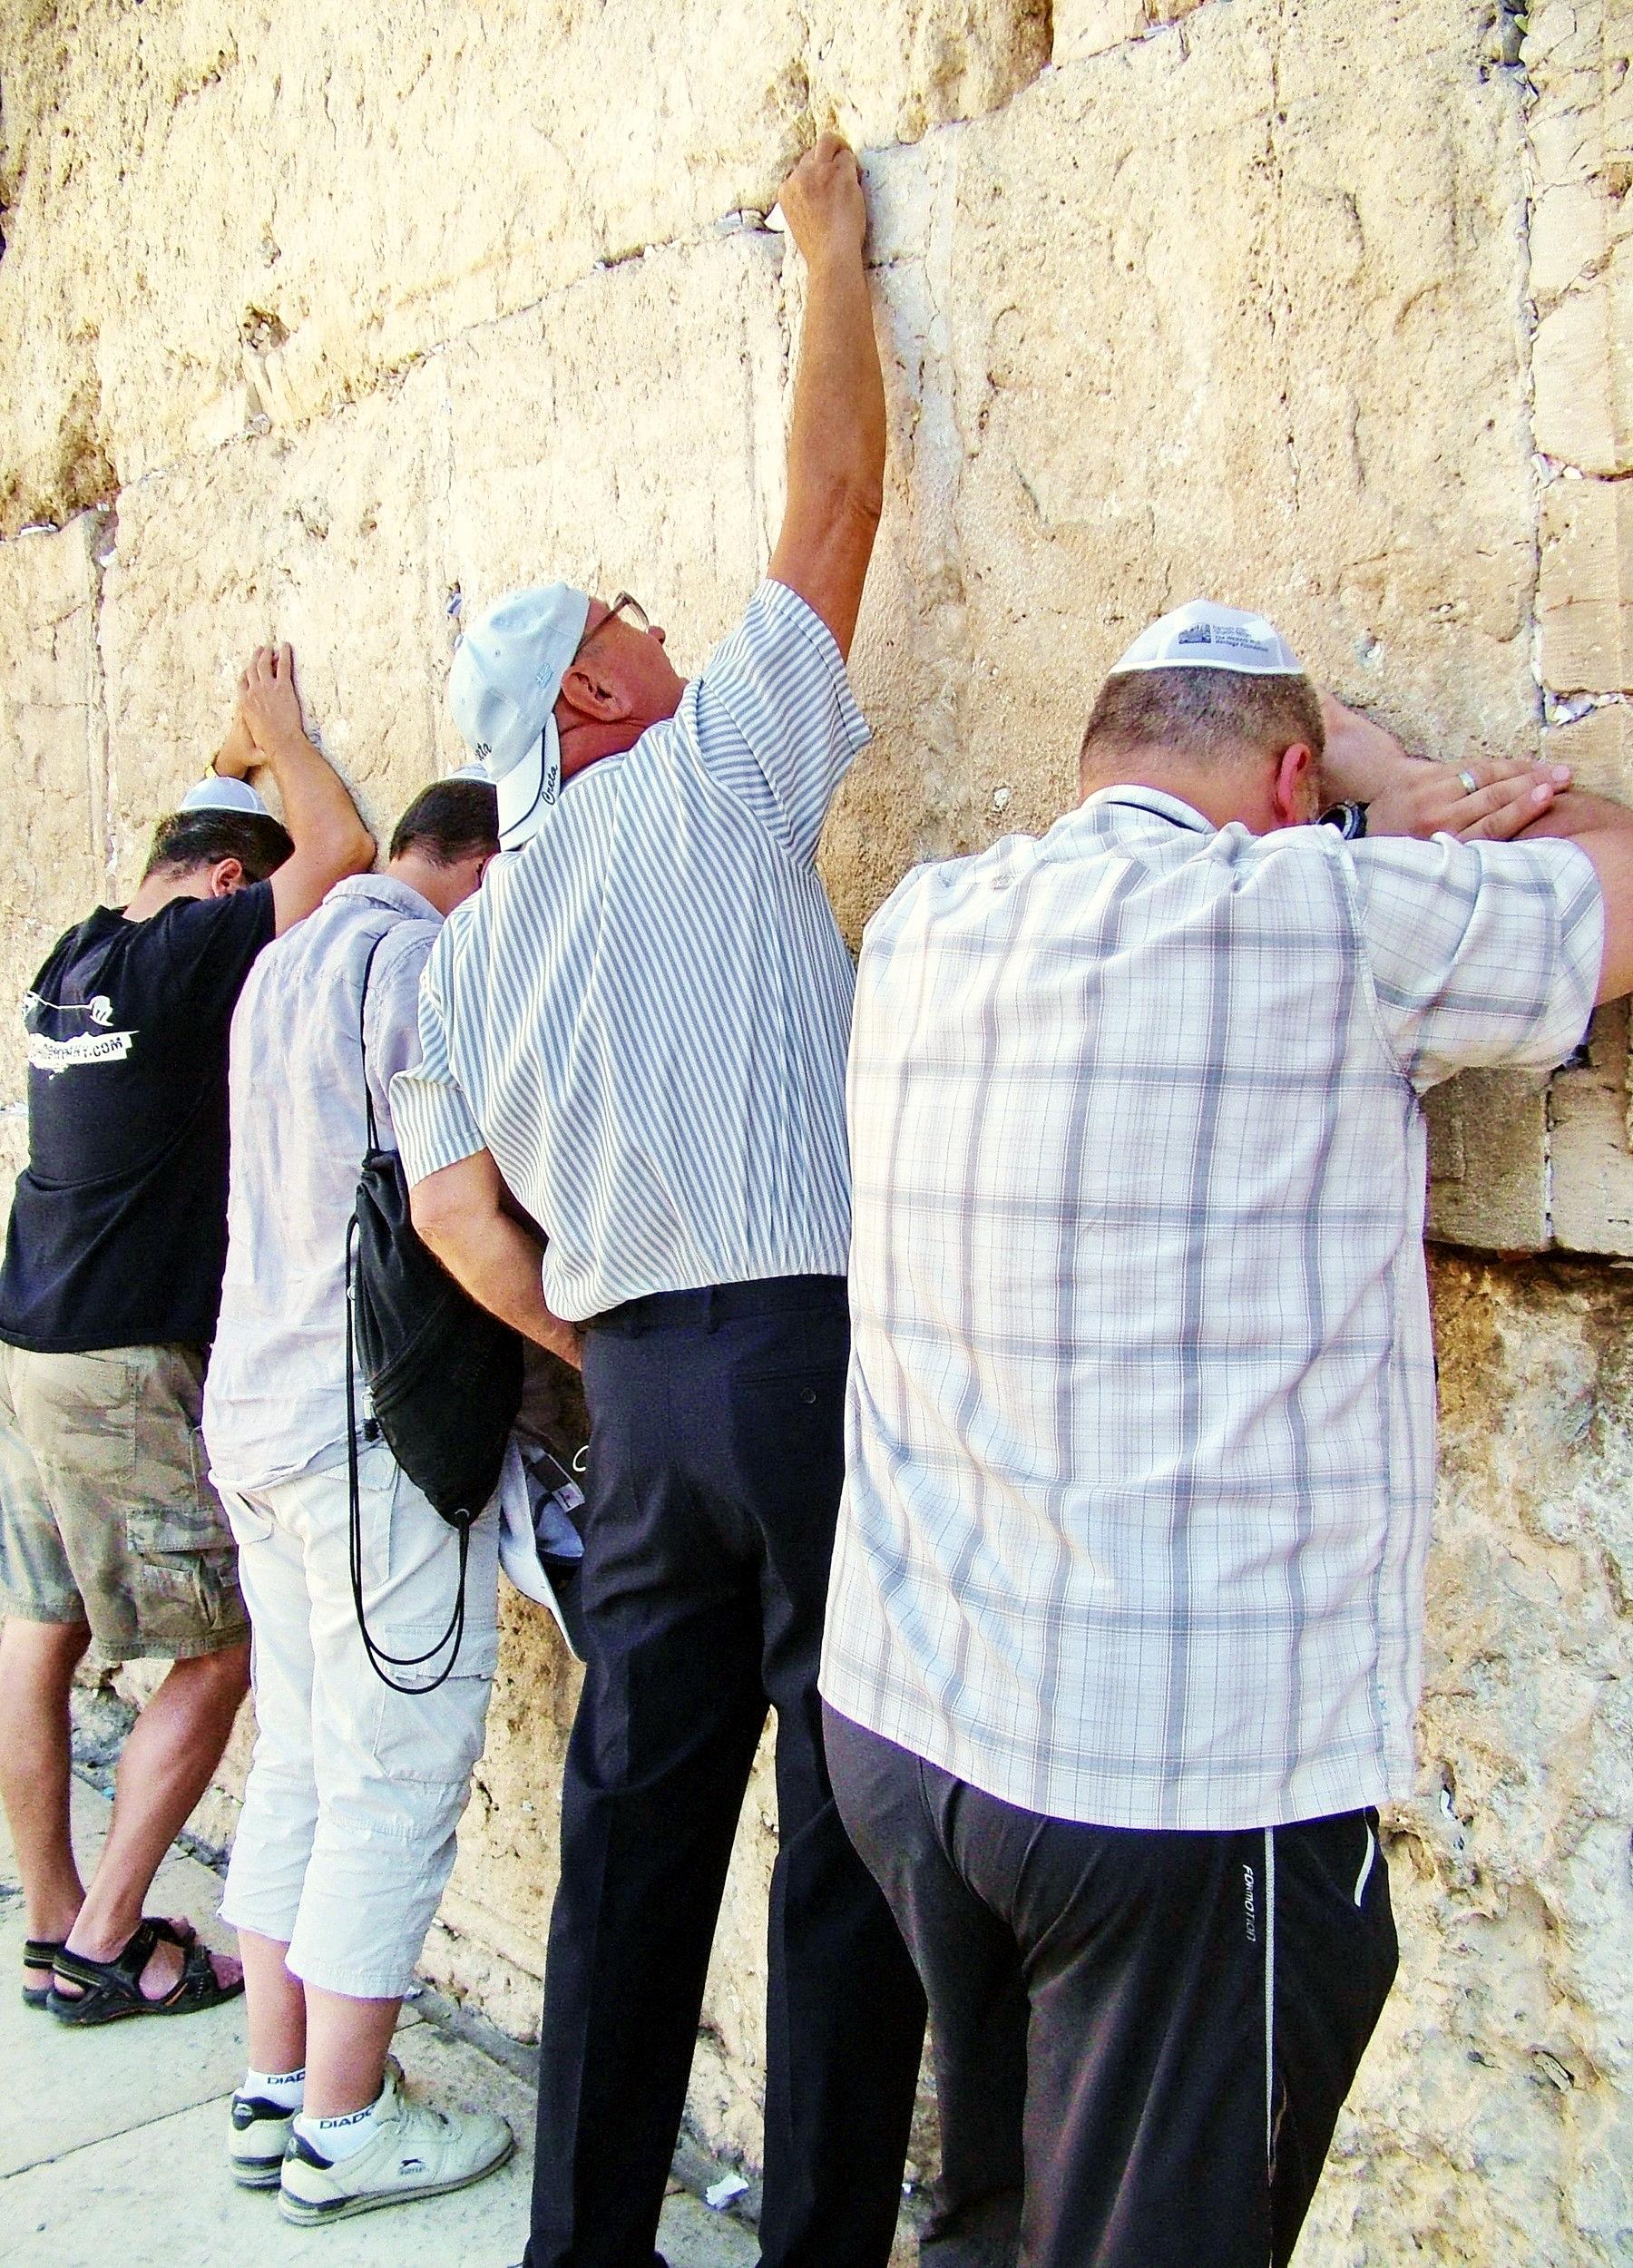 Western Wailing Wall Kotel Jerusalem praying prayer